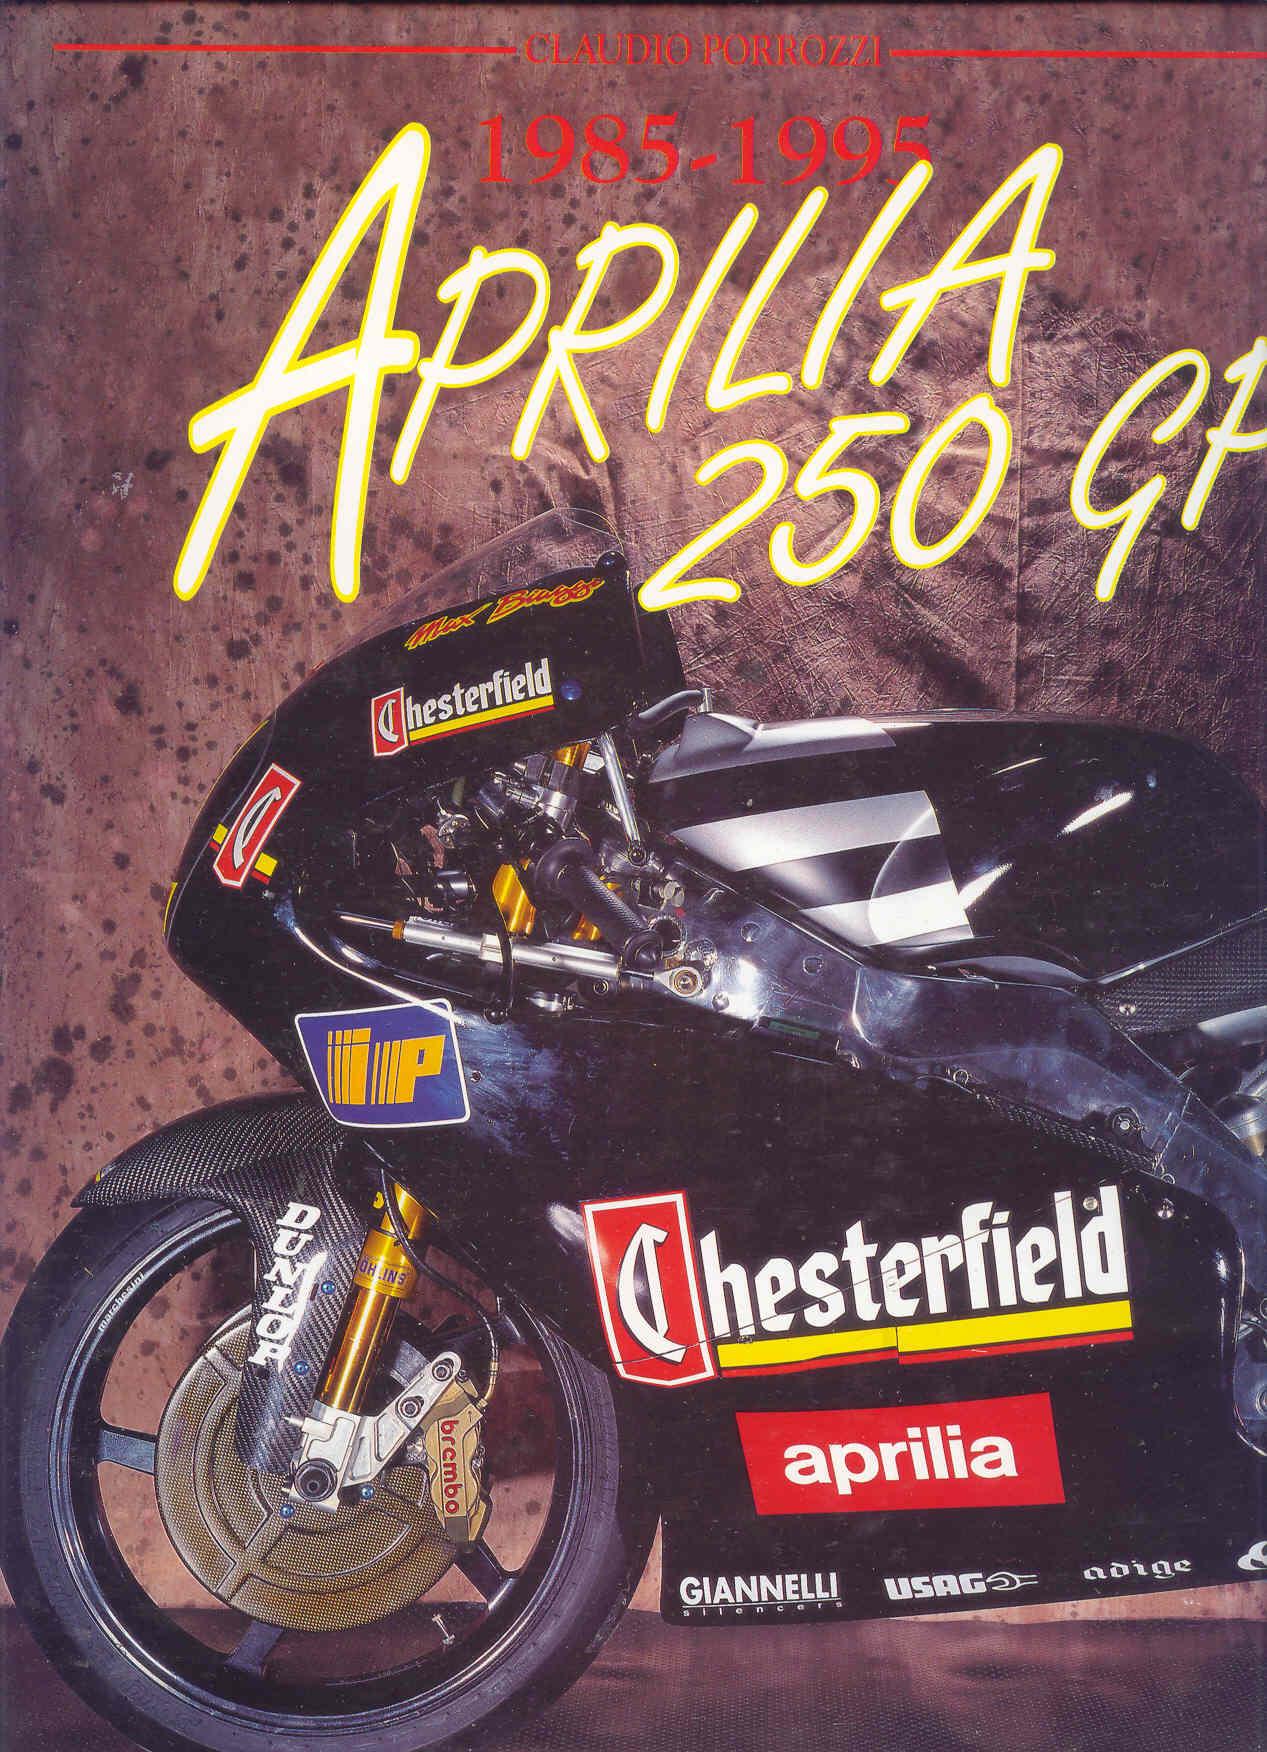 1985-1995. Aprilia 250 GP